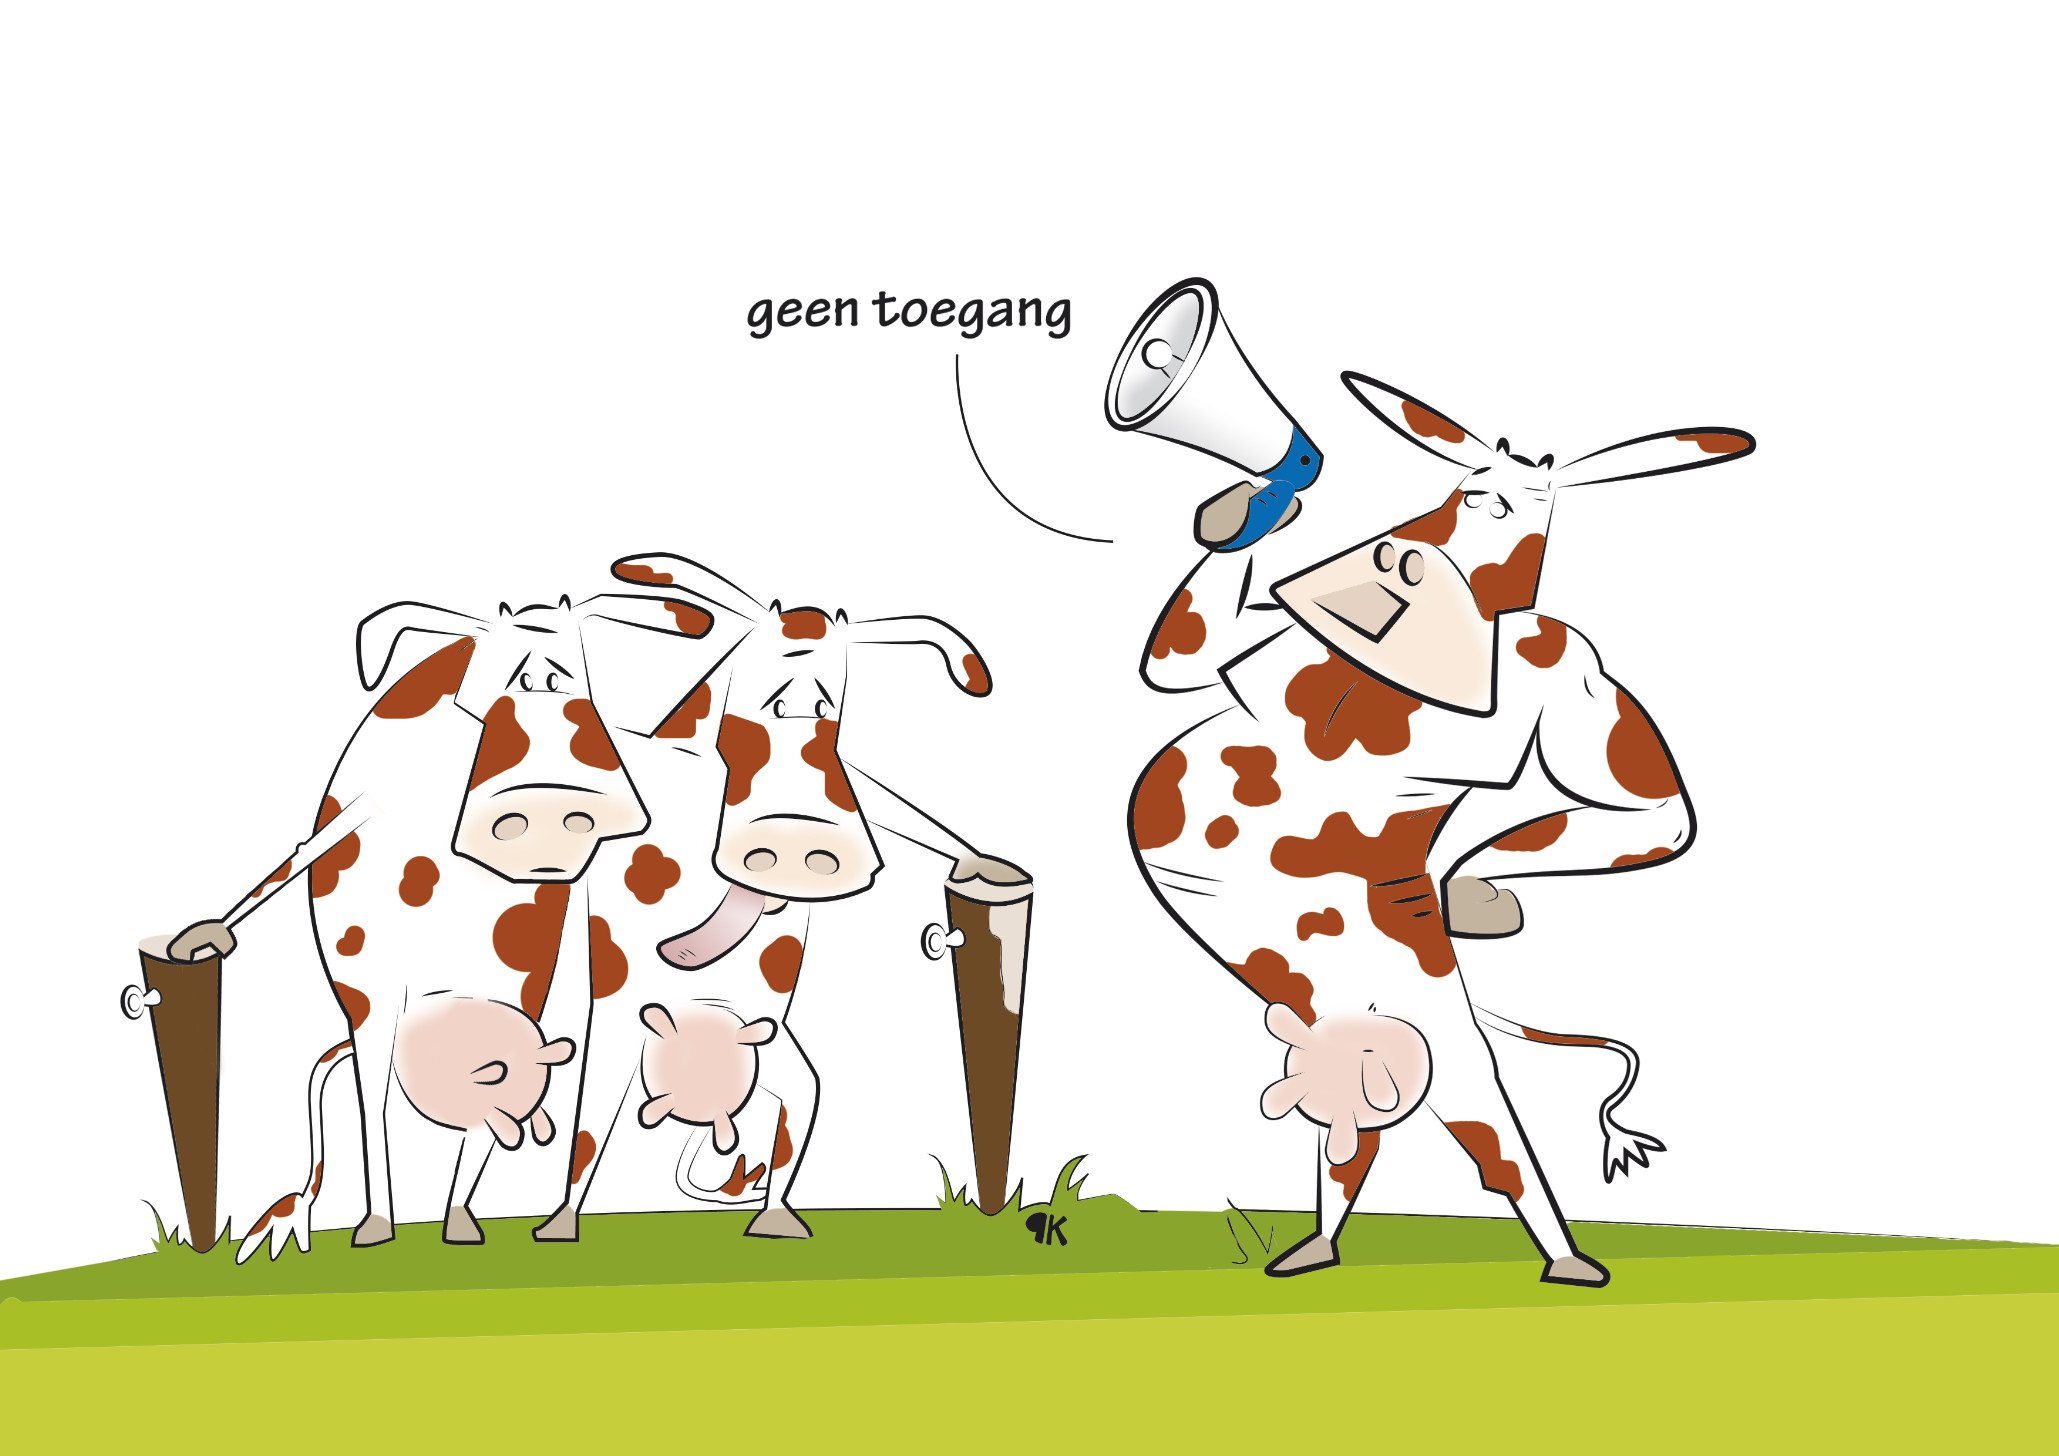 grond sanerings bedrijven in noord holland